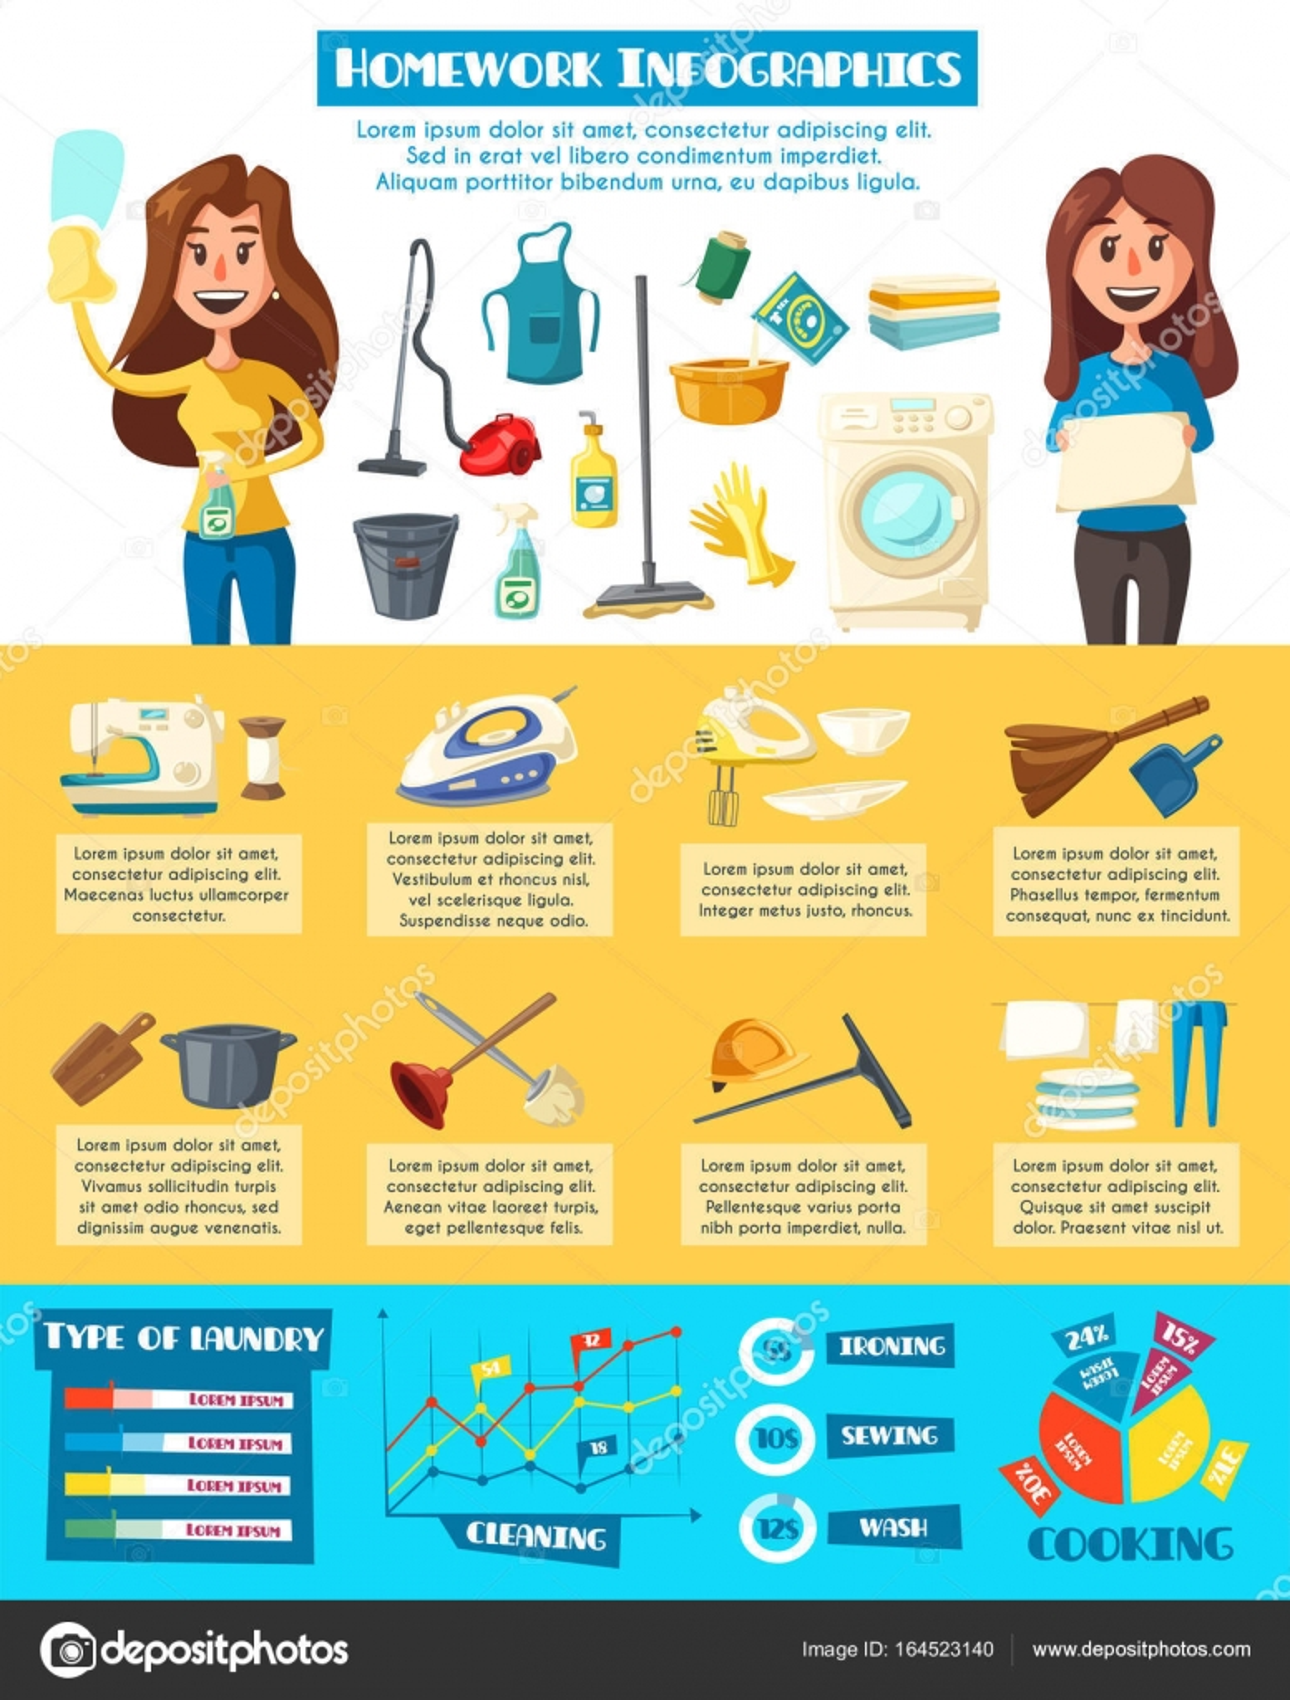 Fotos tareas del hogar plantilla de dise o infogr fico for Planning faccende domestiche